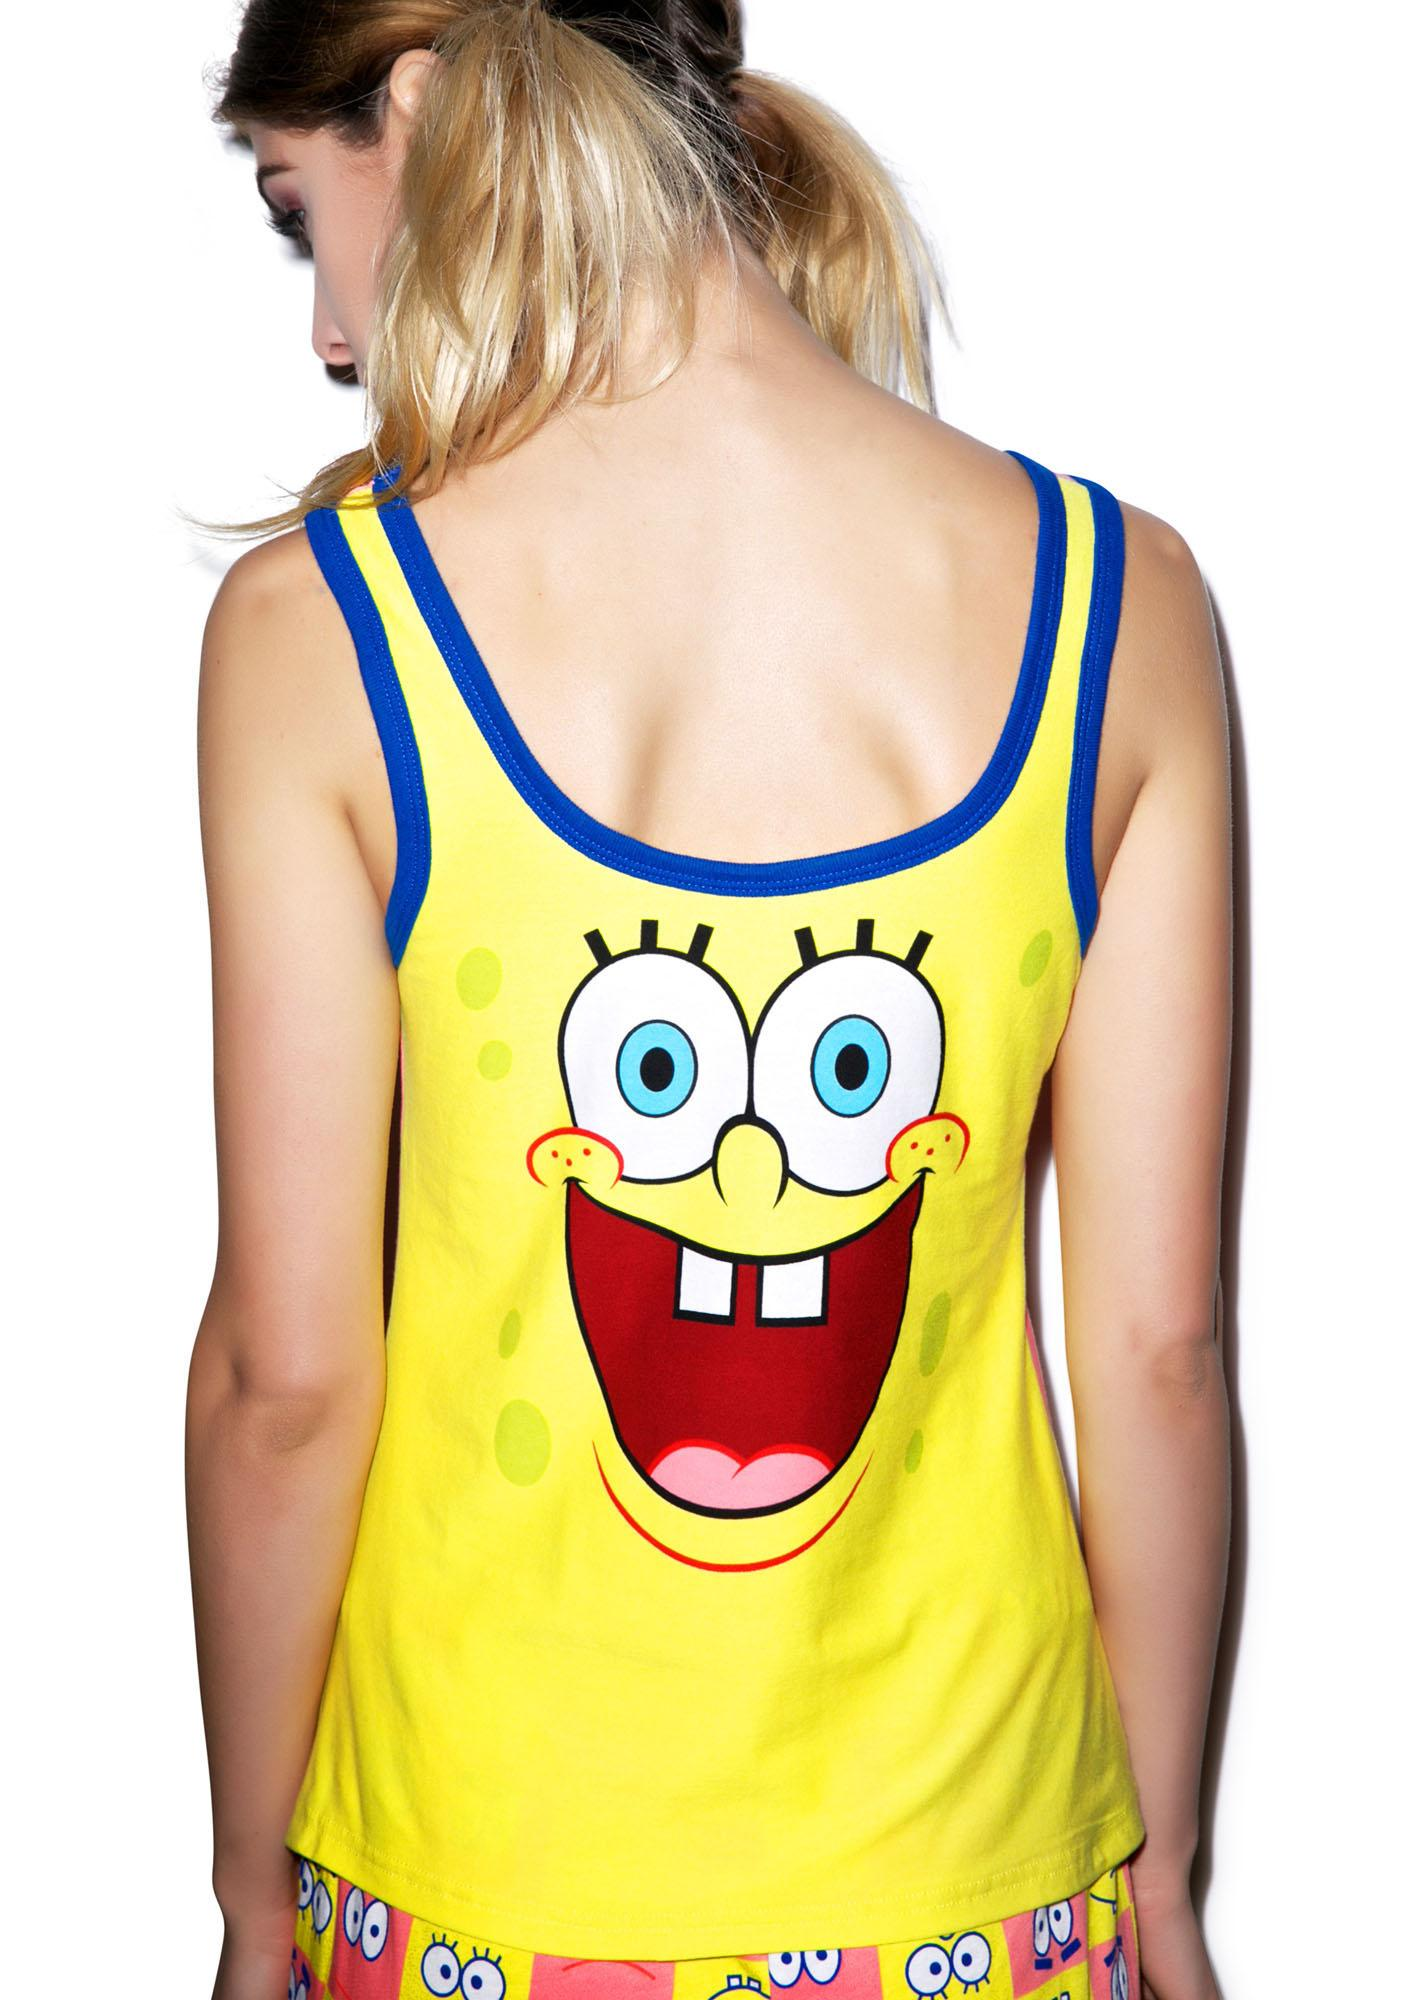 Undergirl Spongebob And Patrick Sleep Set